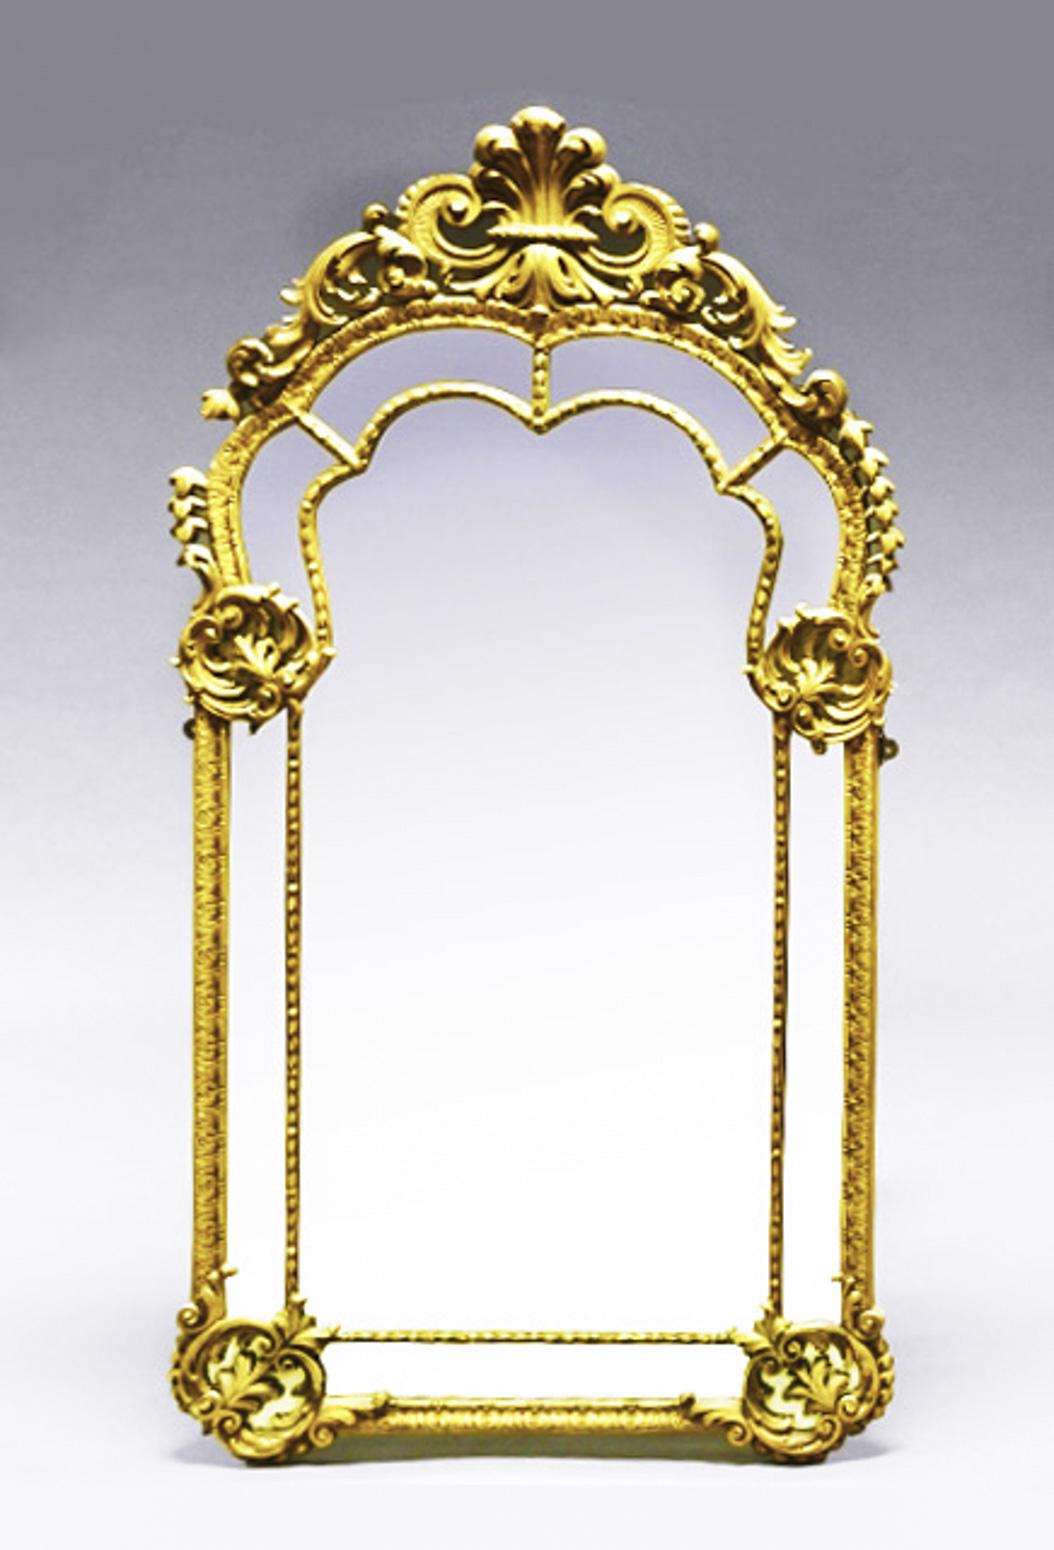 Antique French Giltwood Ref No 07609 Regent Antiques